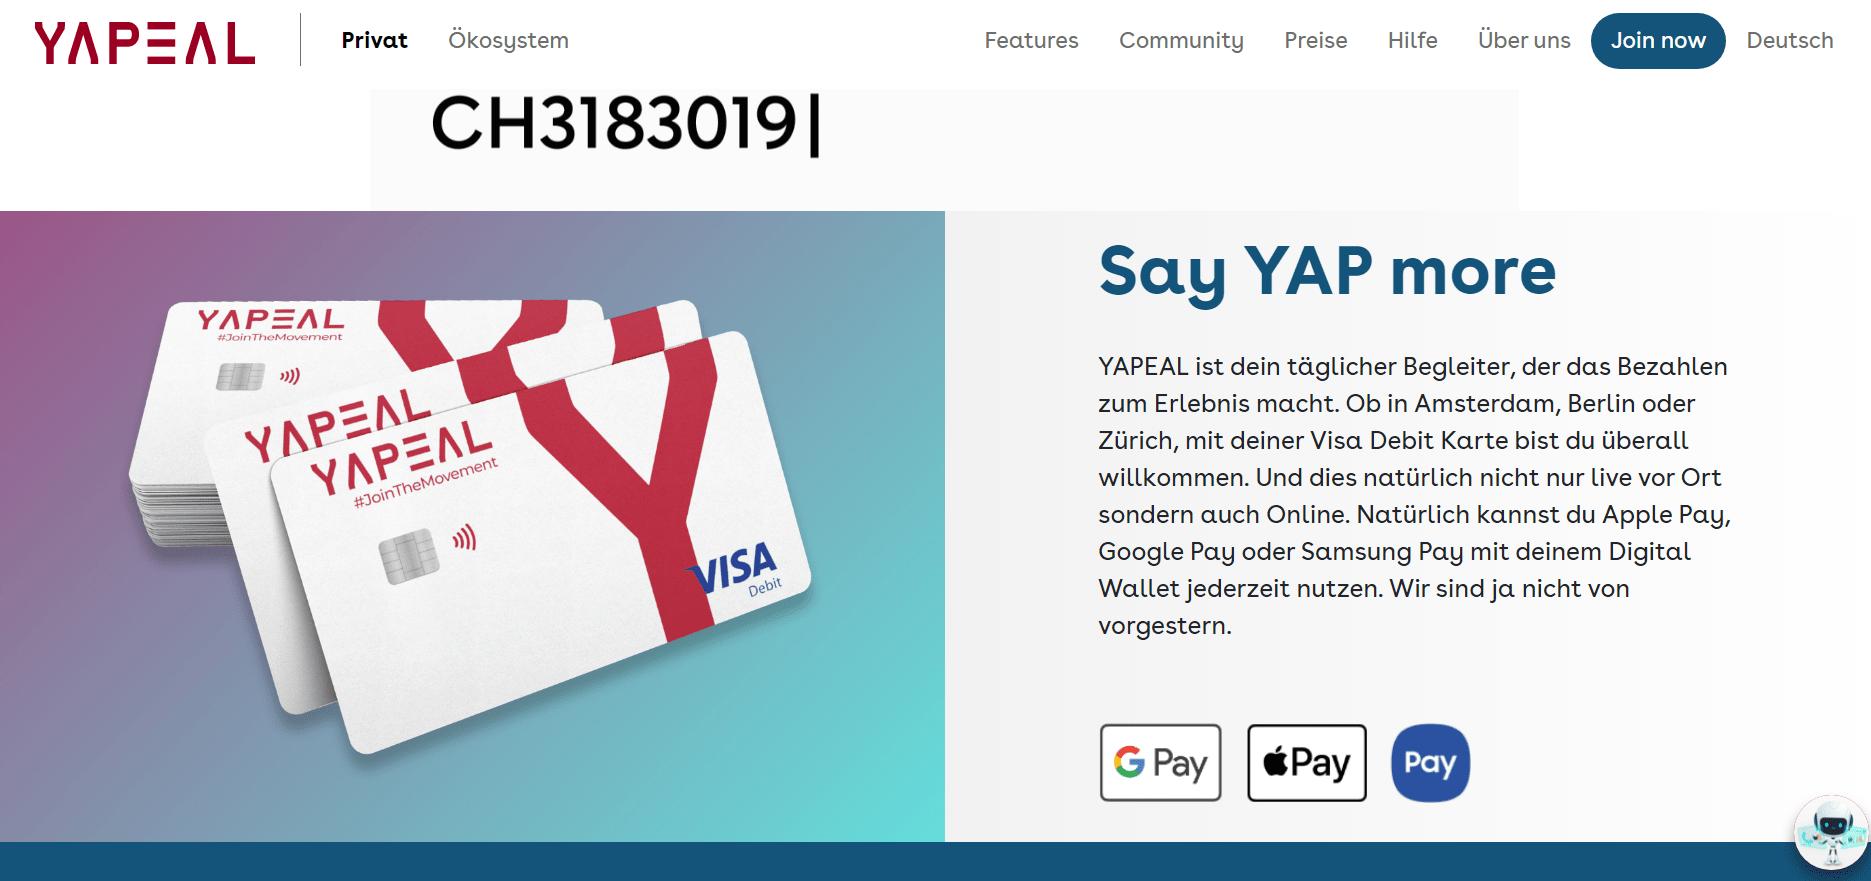 yapeal auszahlung casino